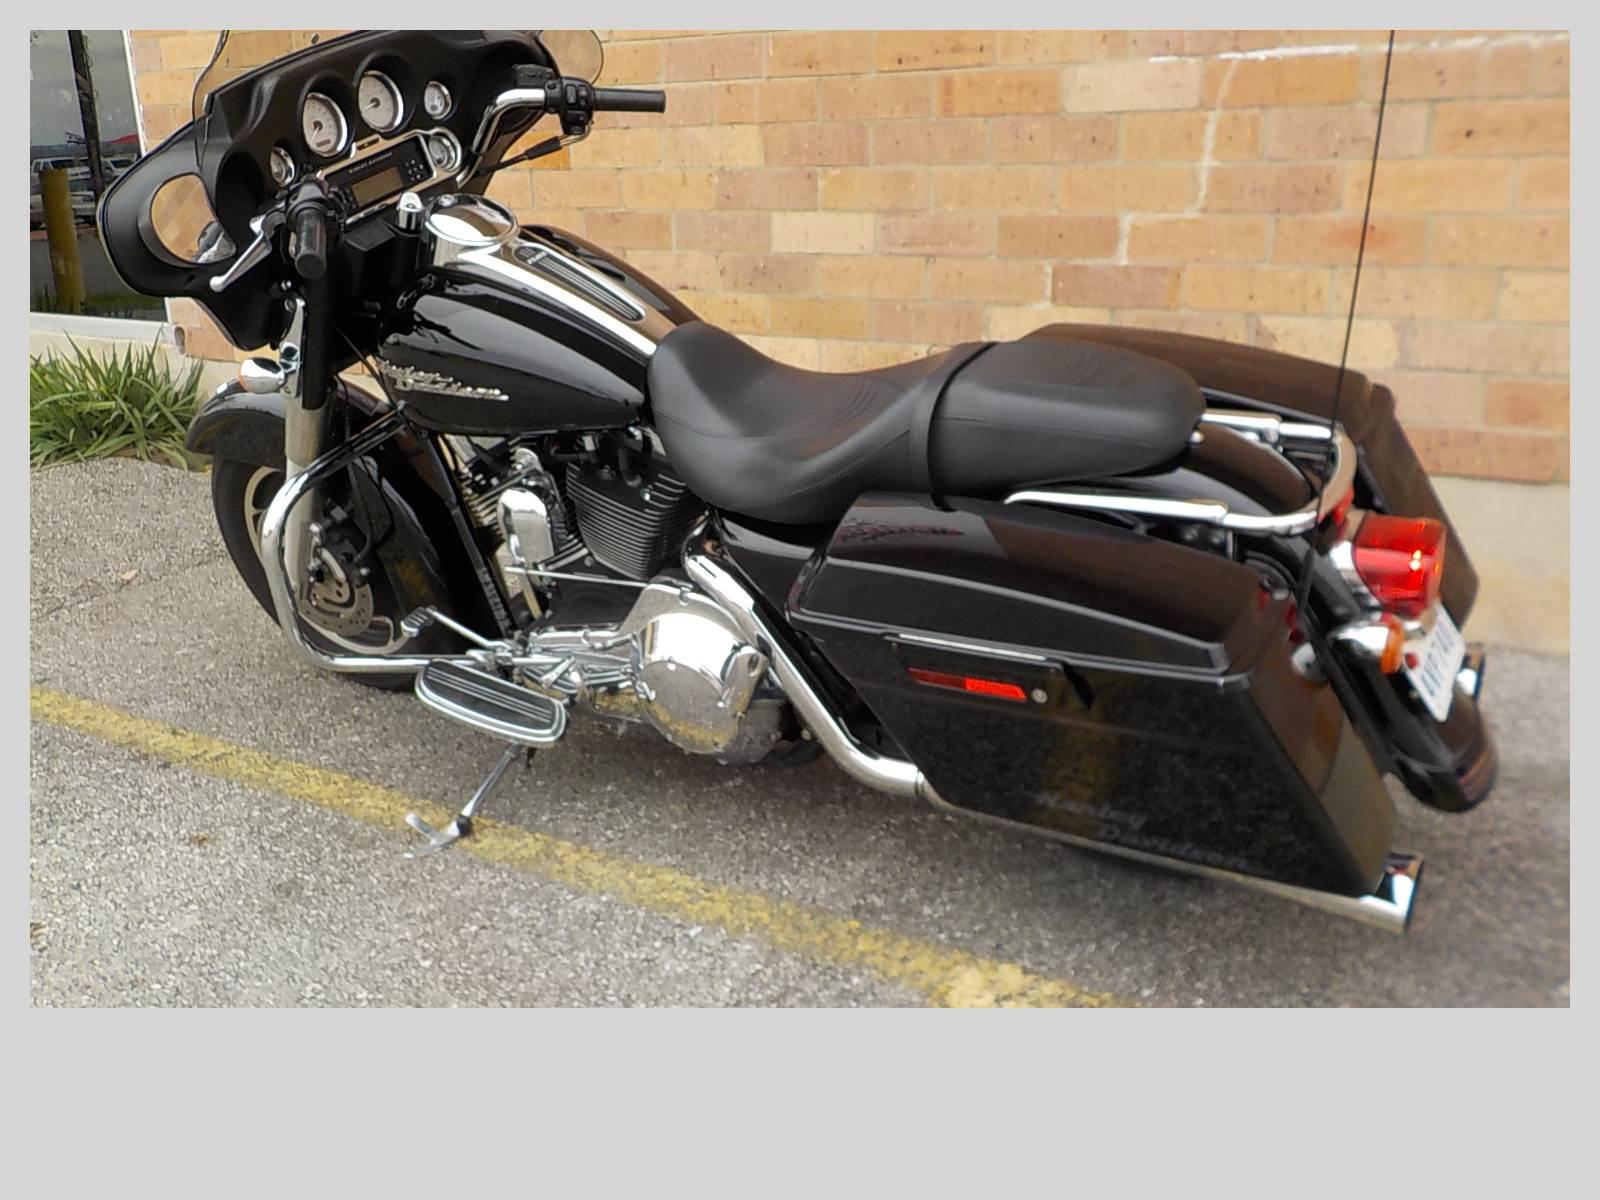 2006 Harley-Davidson Street Glide 6